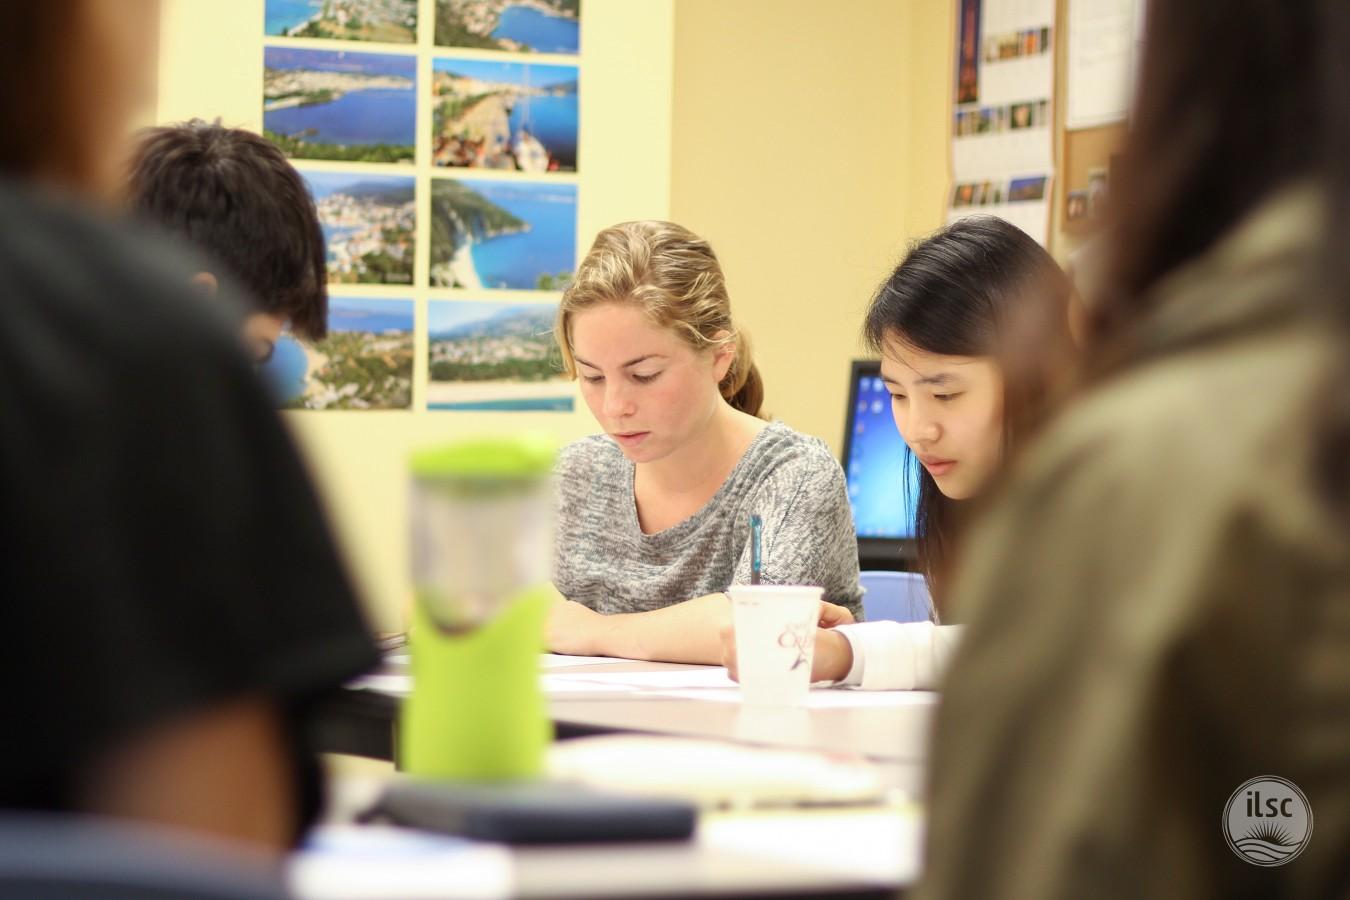 -agentsite-photo-list-ILSC-Vancouver-10_Classroom_08